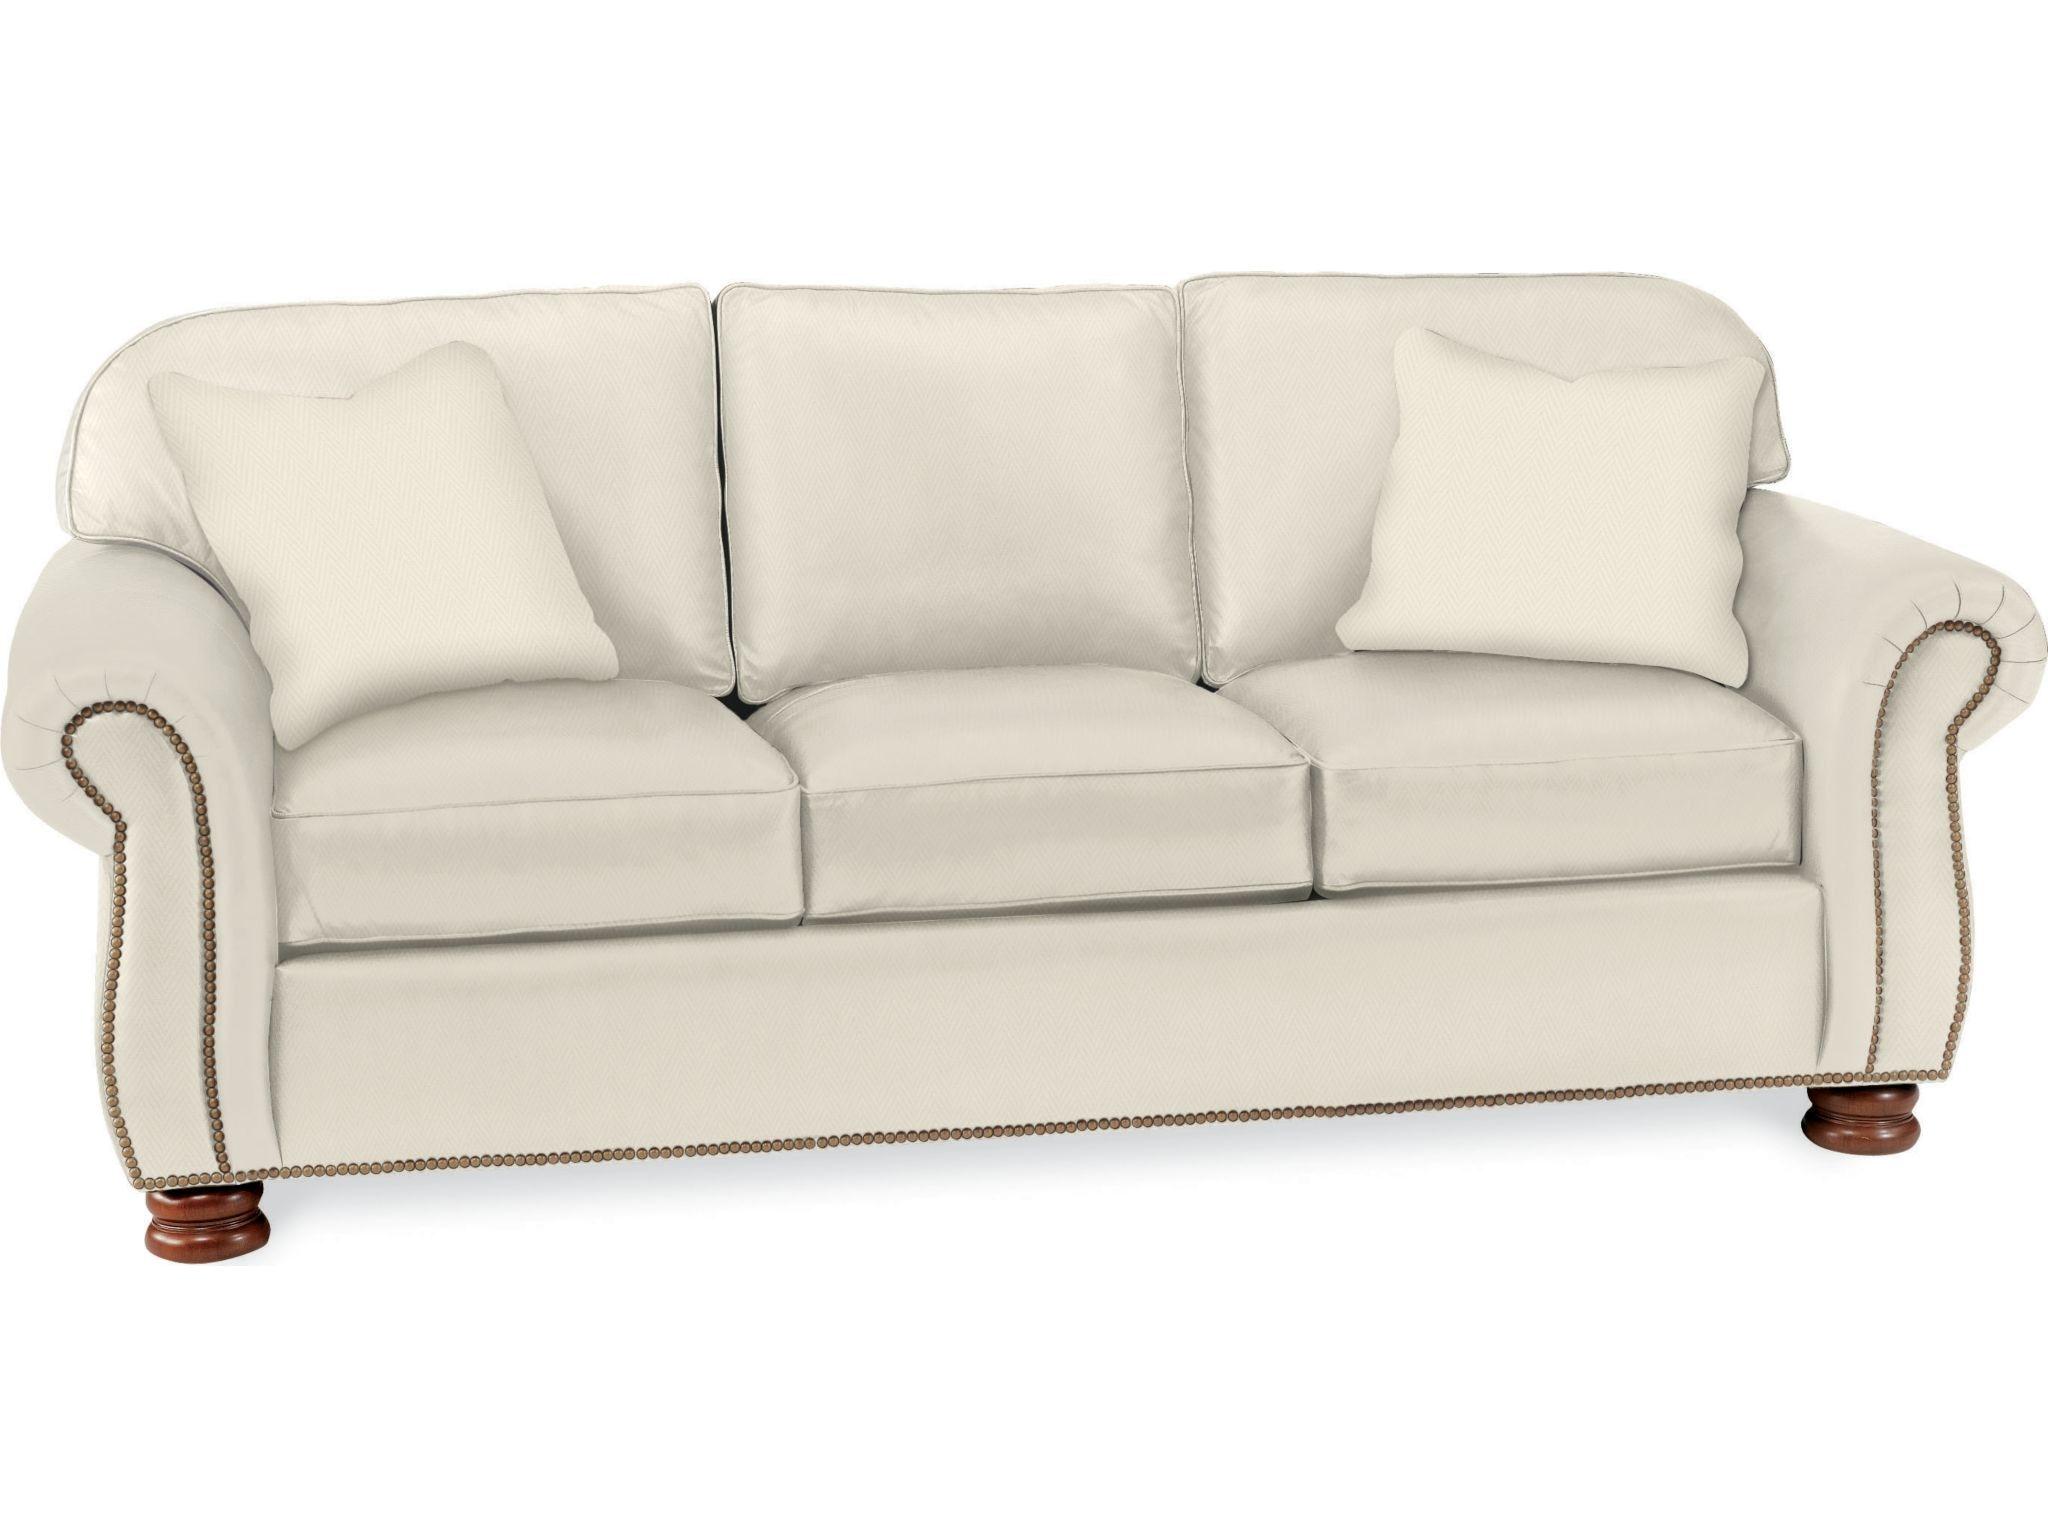 thomasville benjamin sofa carlyle sofas reviews living room 3 seat 1461 31